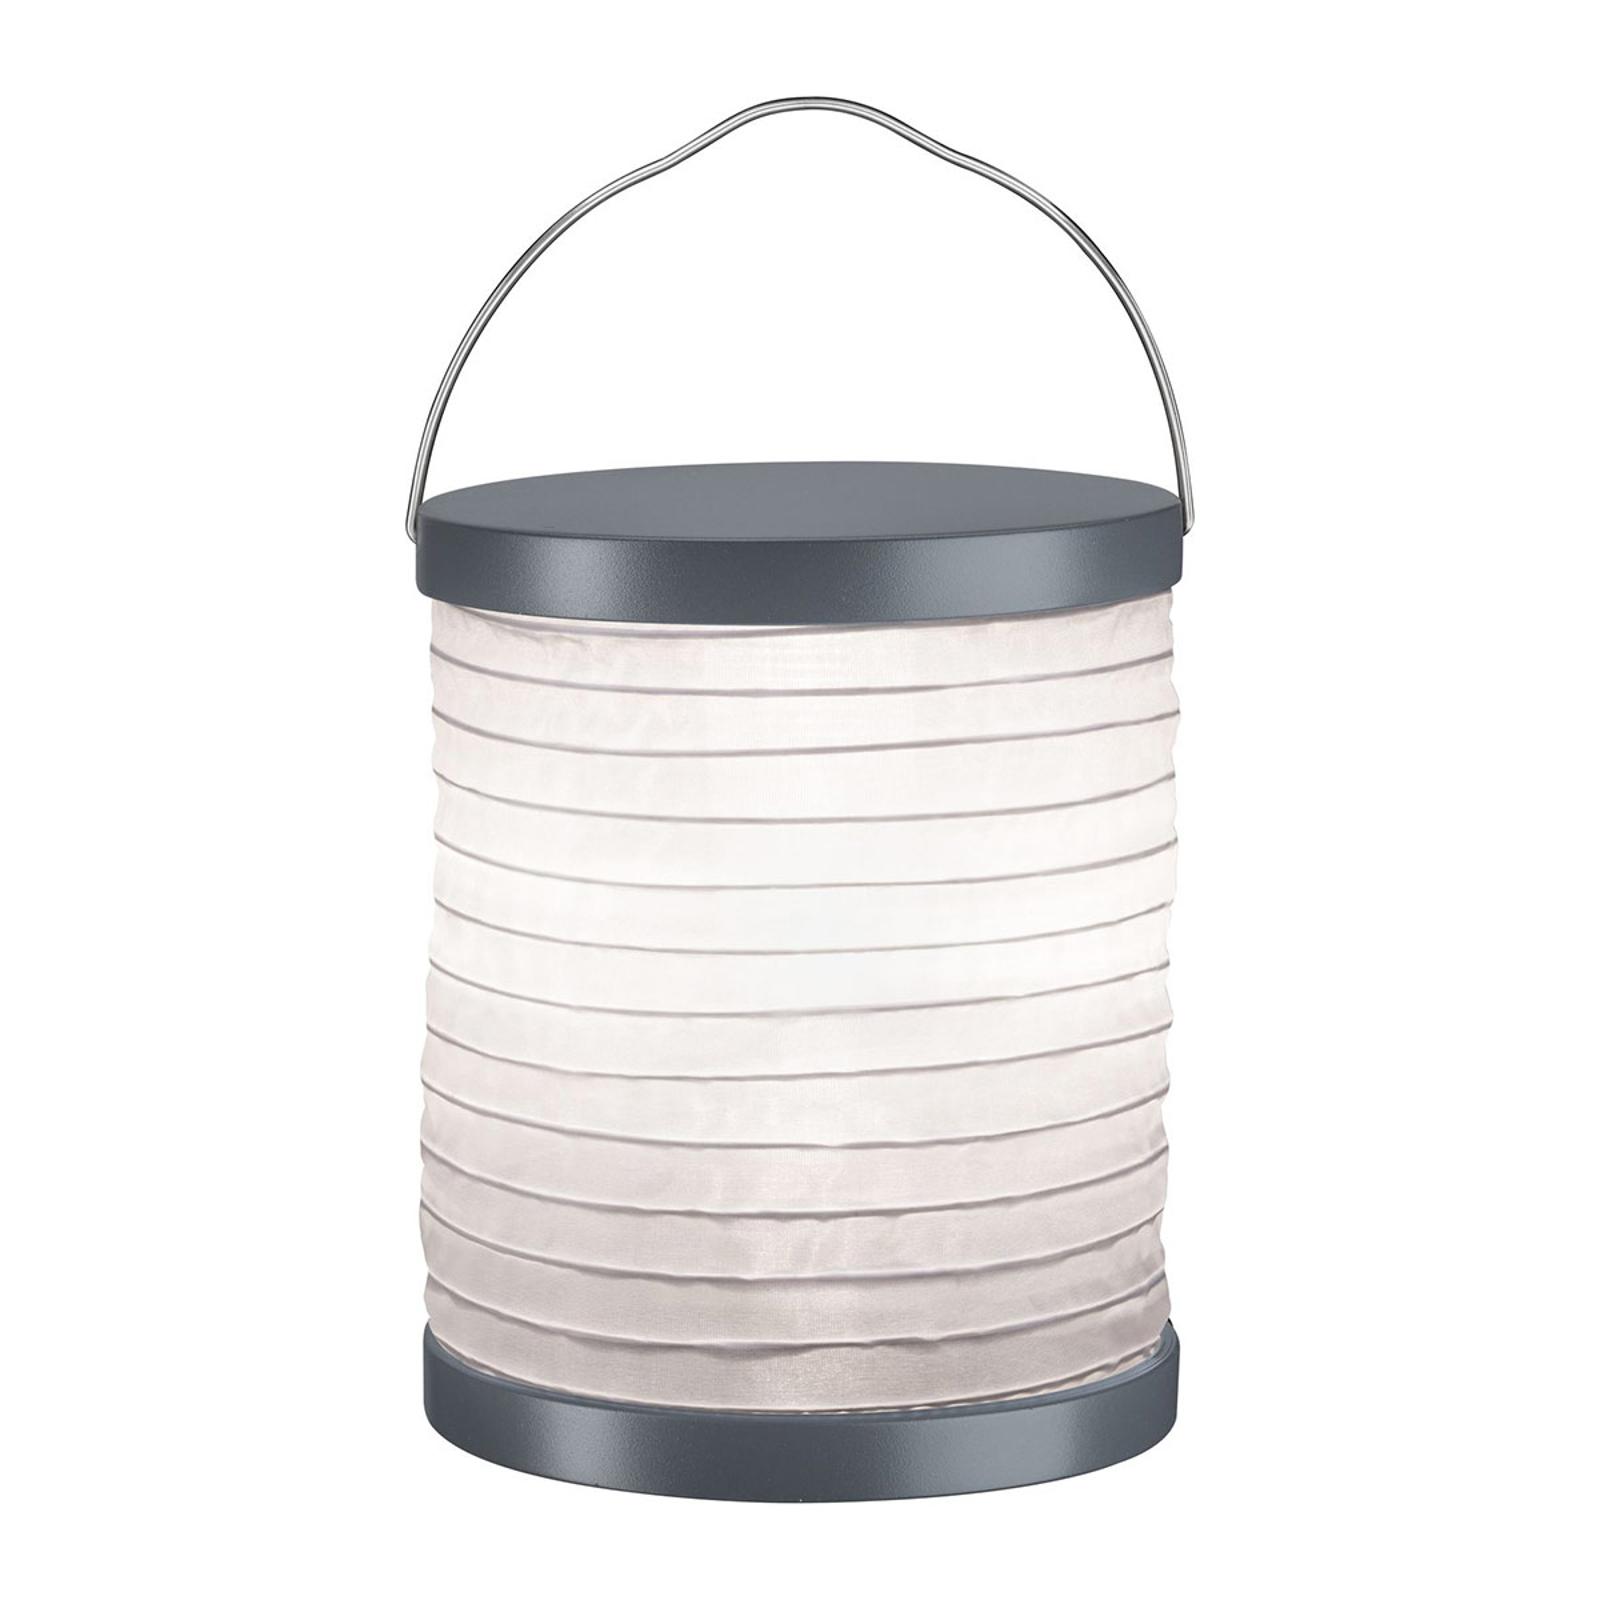 Paulmann Mobile Lampion Tischlampe Akku grau